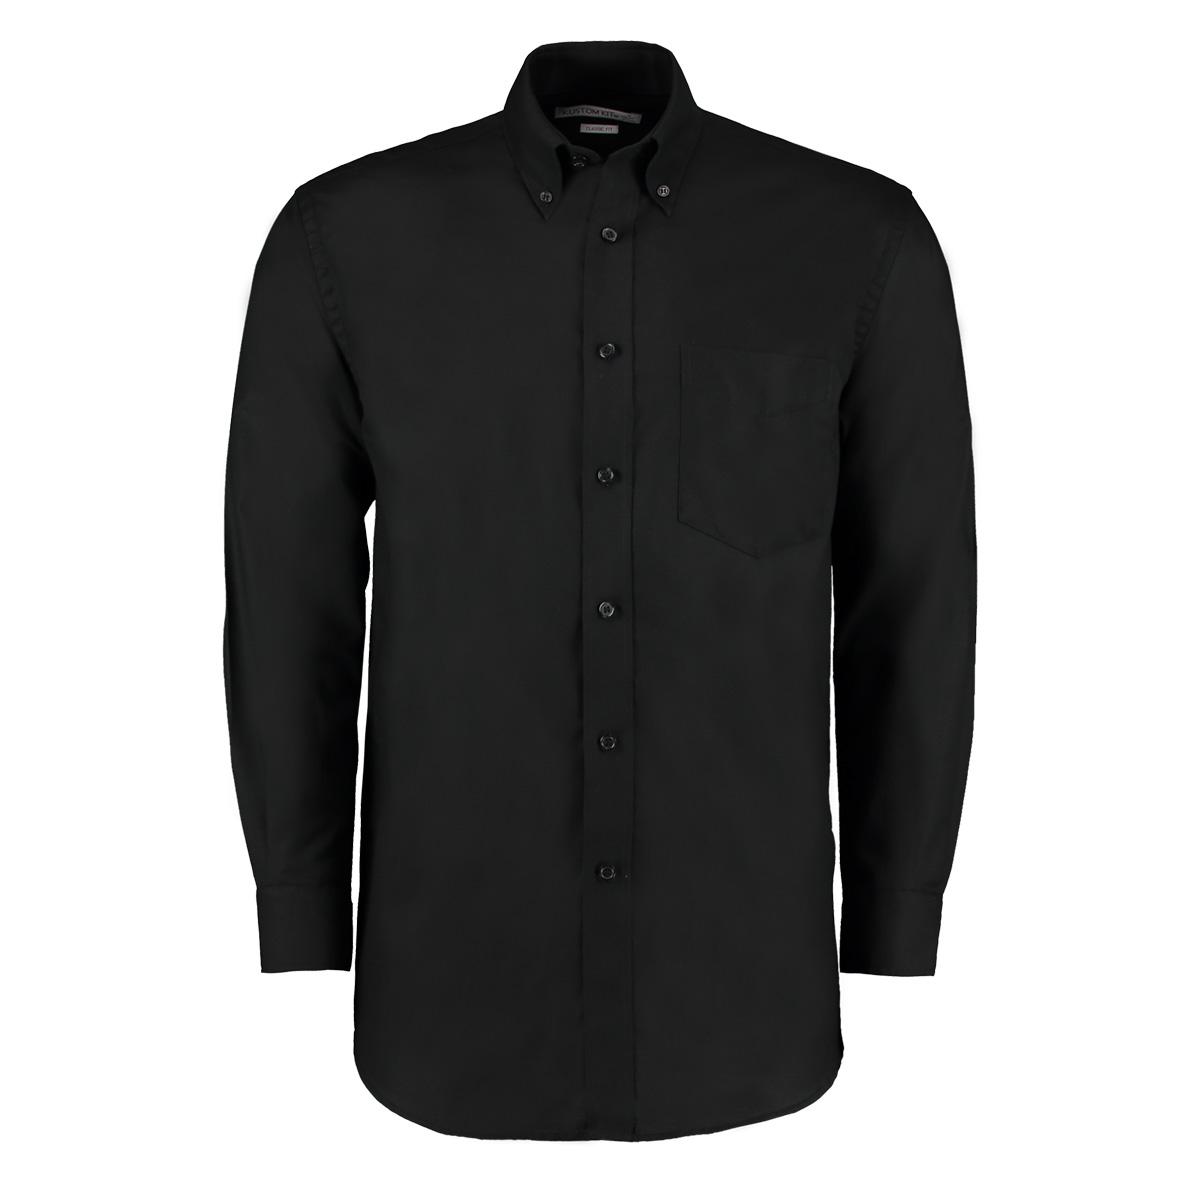 Kk351 Workwear Oxford Shirt Kustom Kit